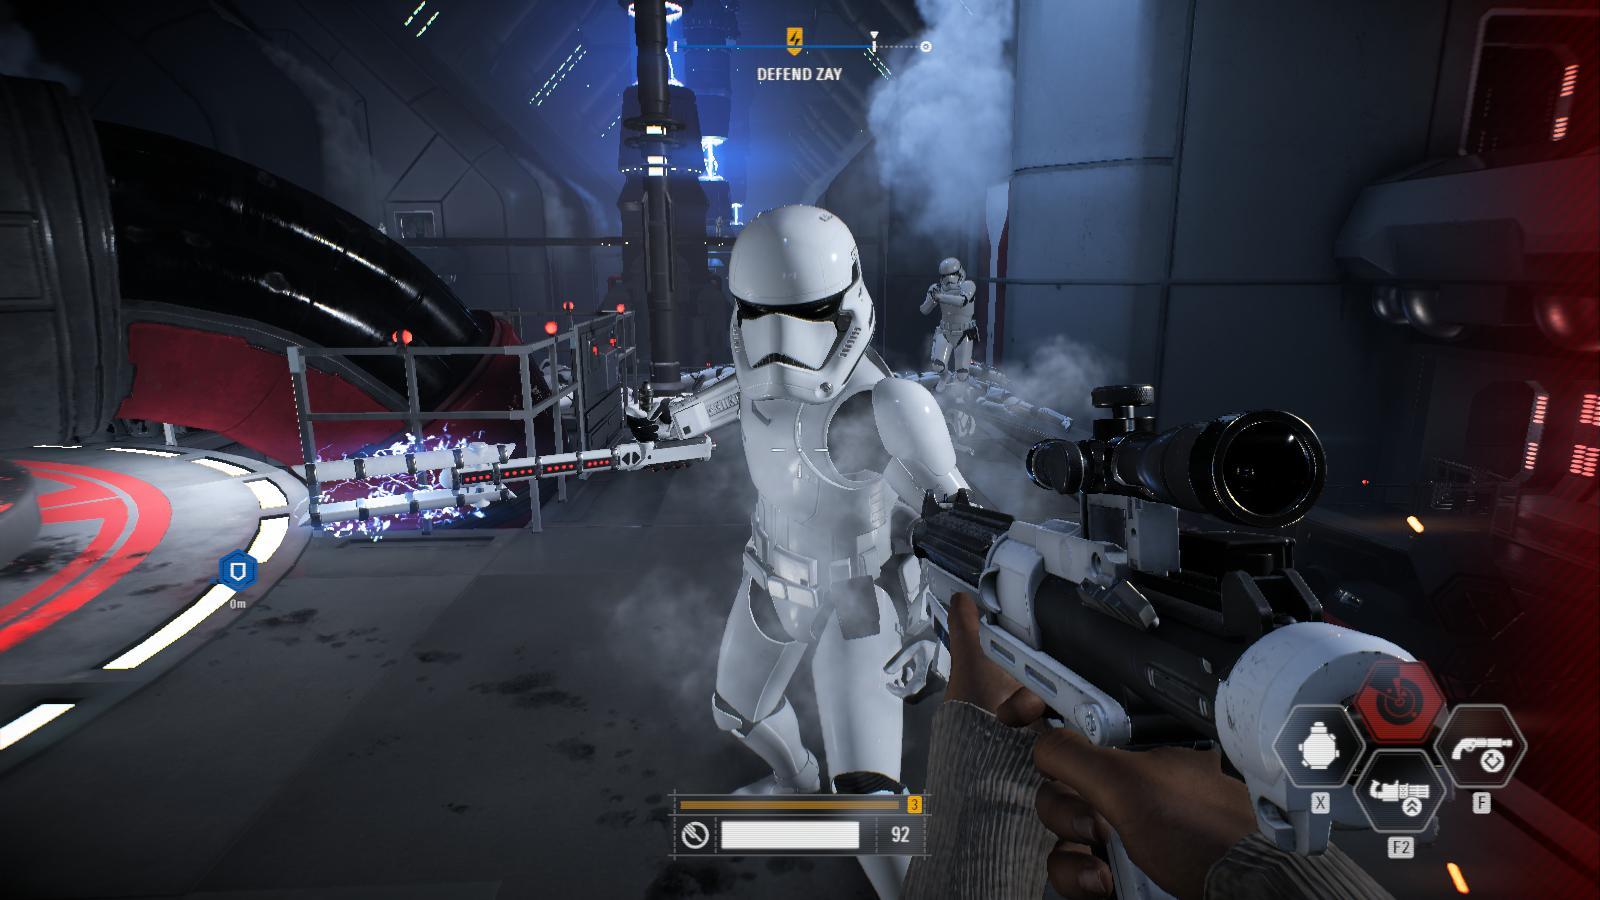 Star Wars Battlefront 2 Getting New